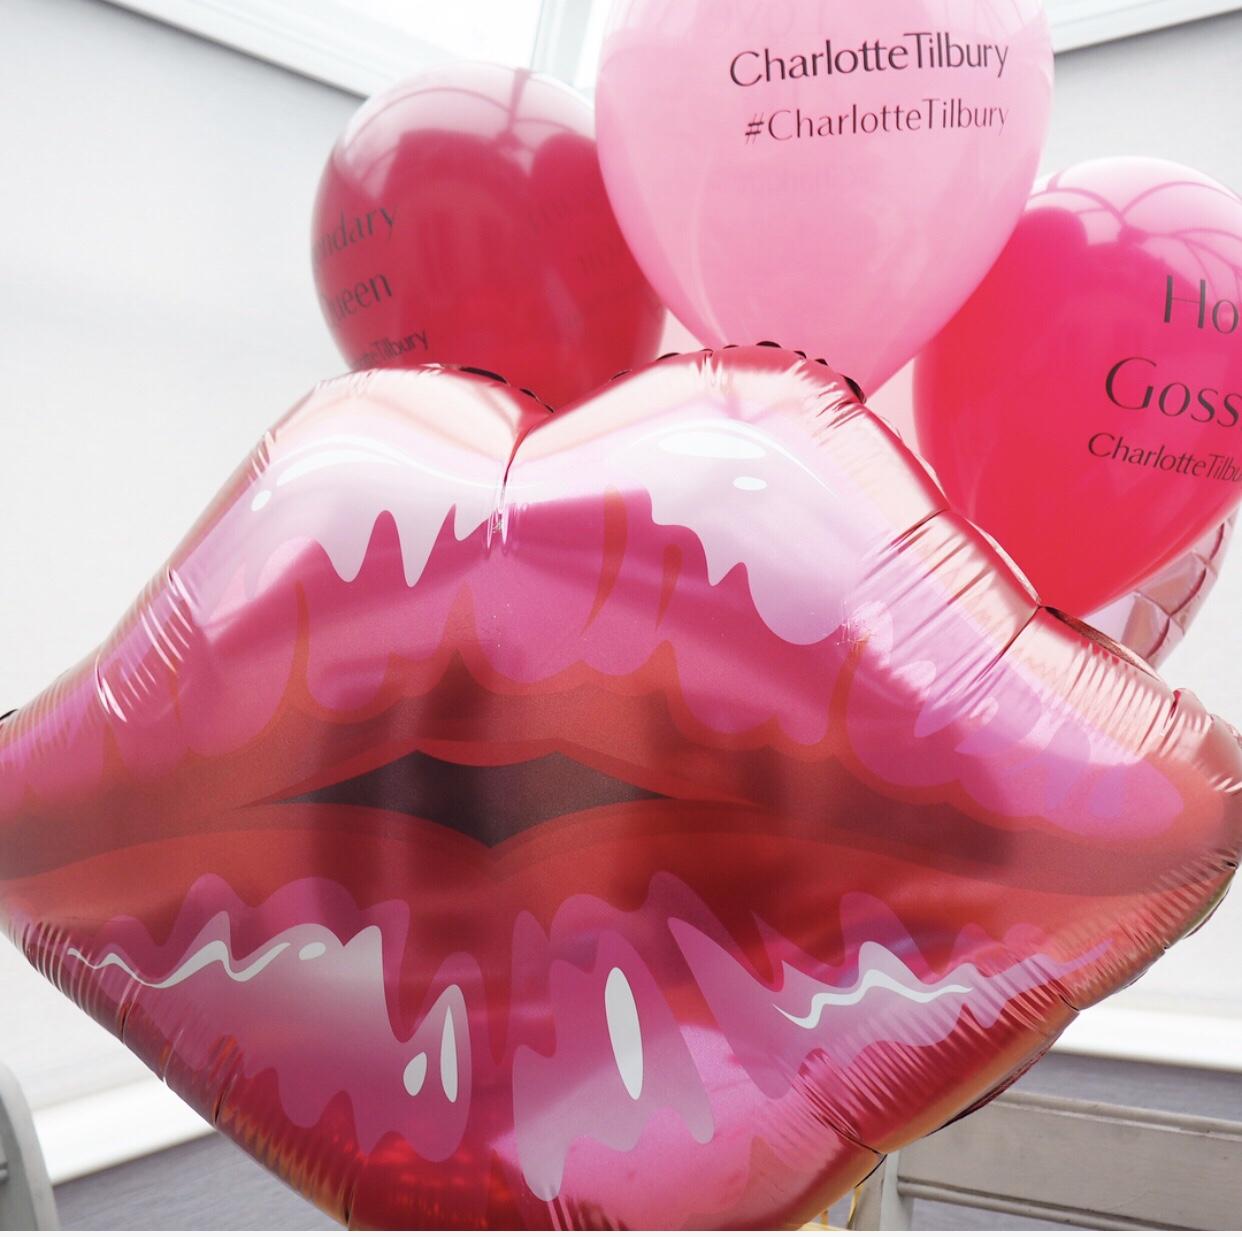 *Charlotte Tilbury Lip Cheats & Lipsticks Review